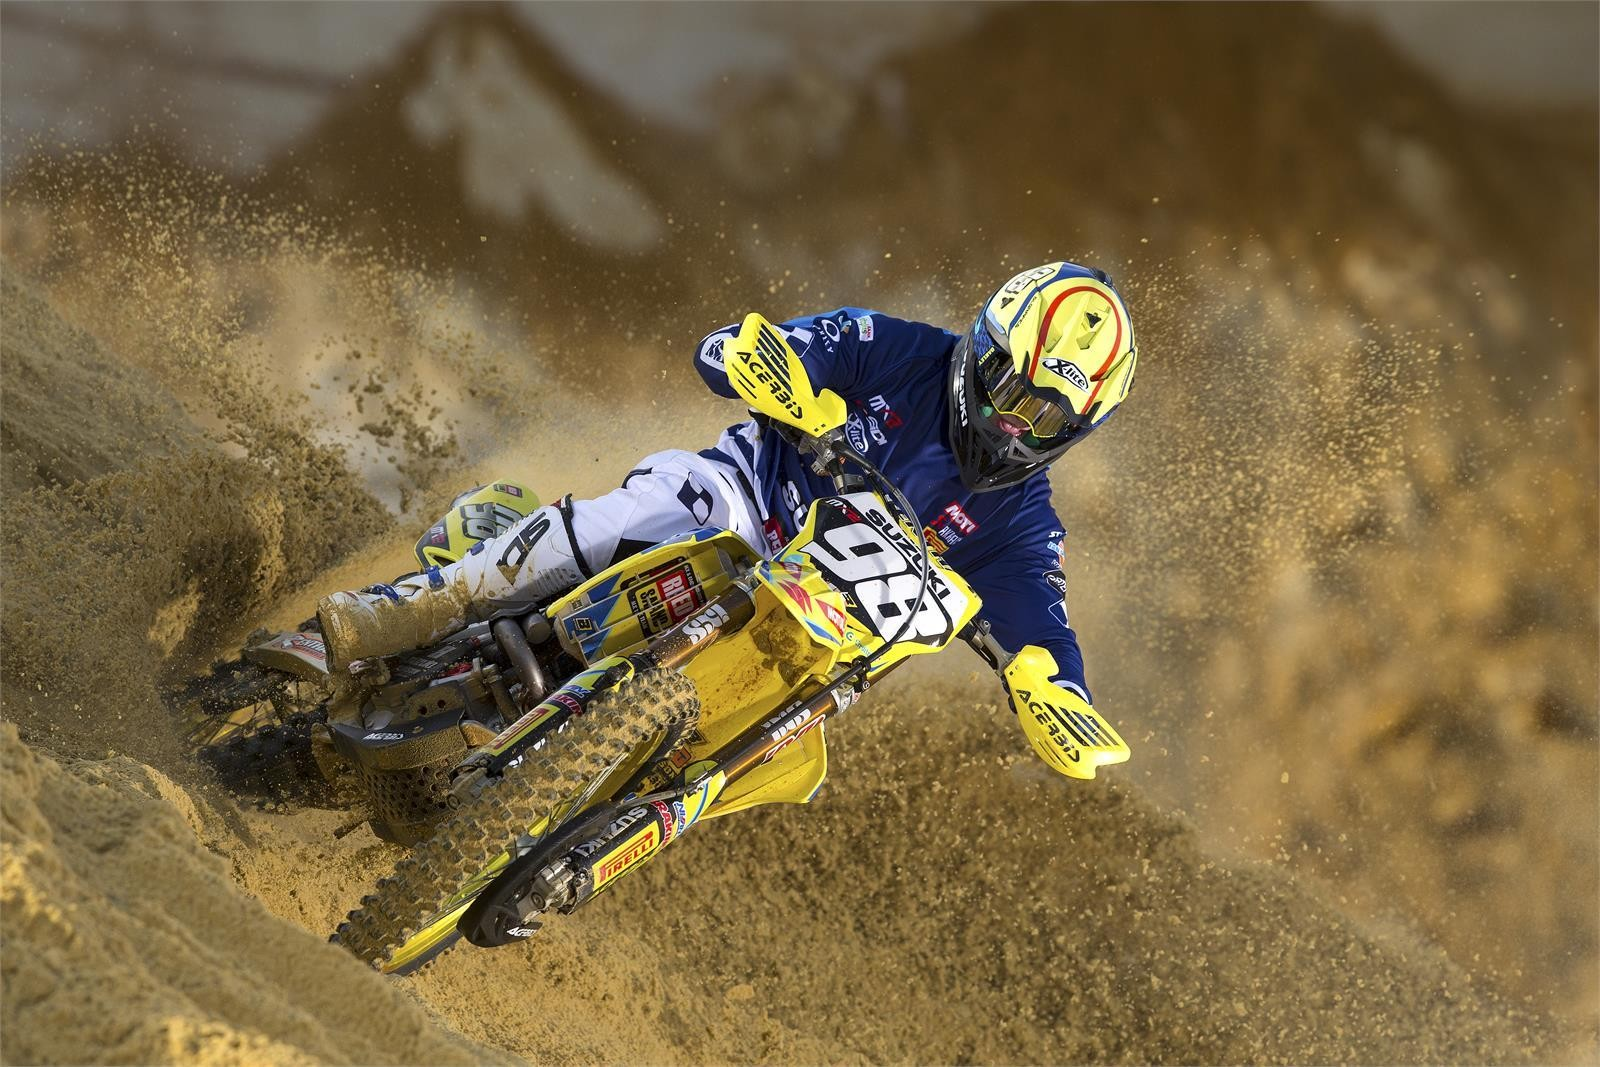 Bas Vaessen - First Look: 2017 Suzuki World MX2 Team - Motocross Pictures - Vital MX